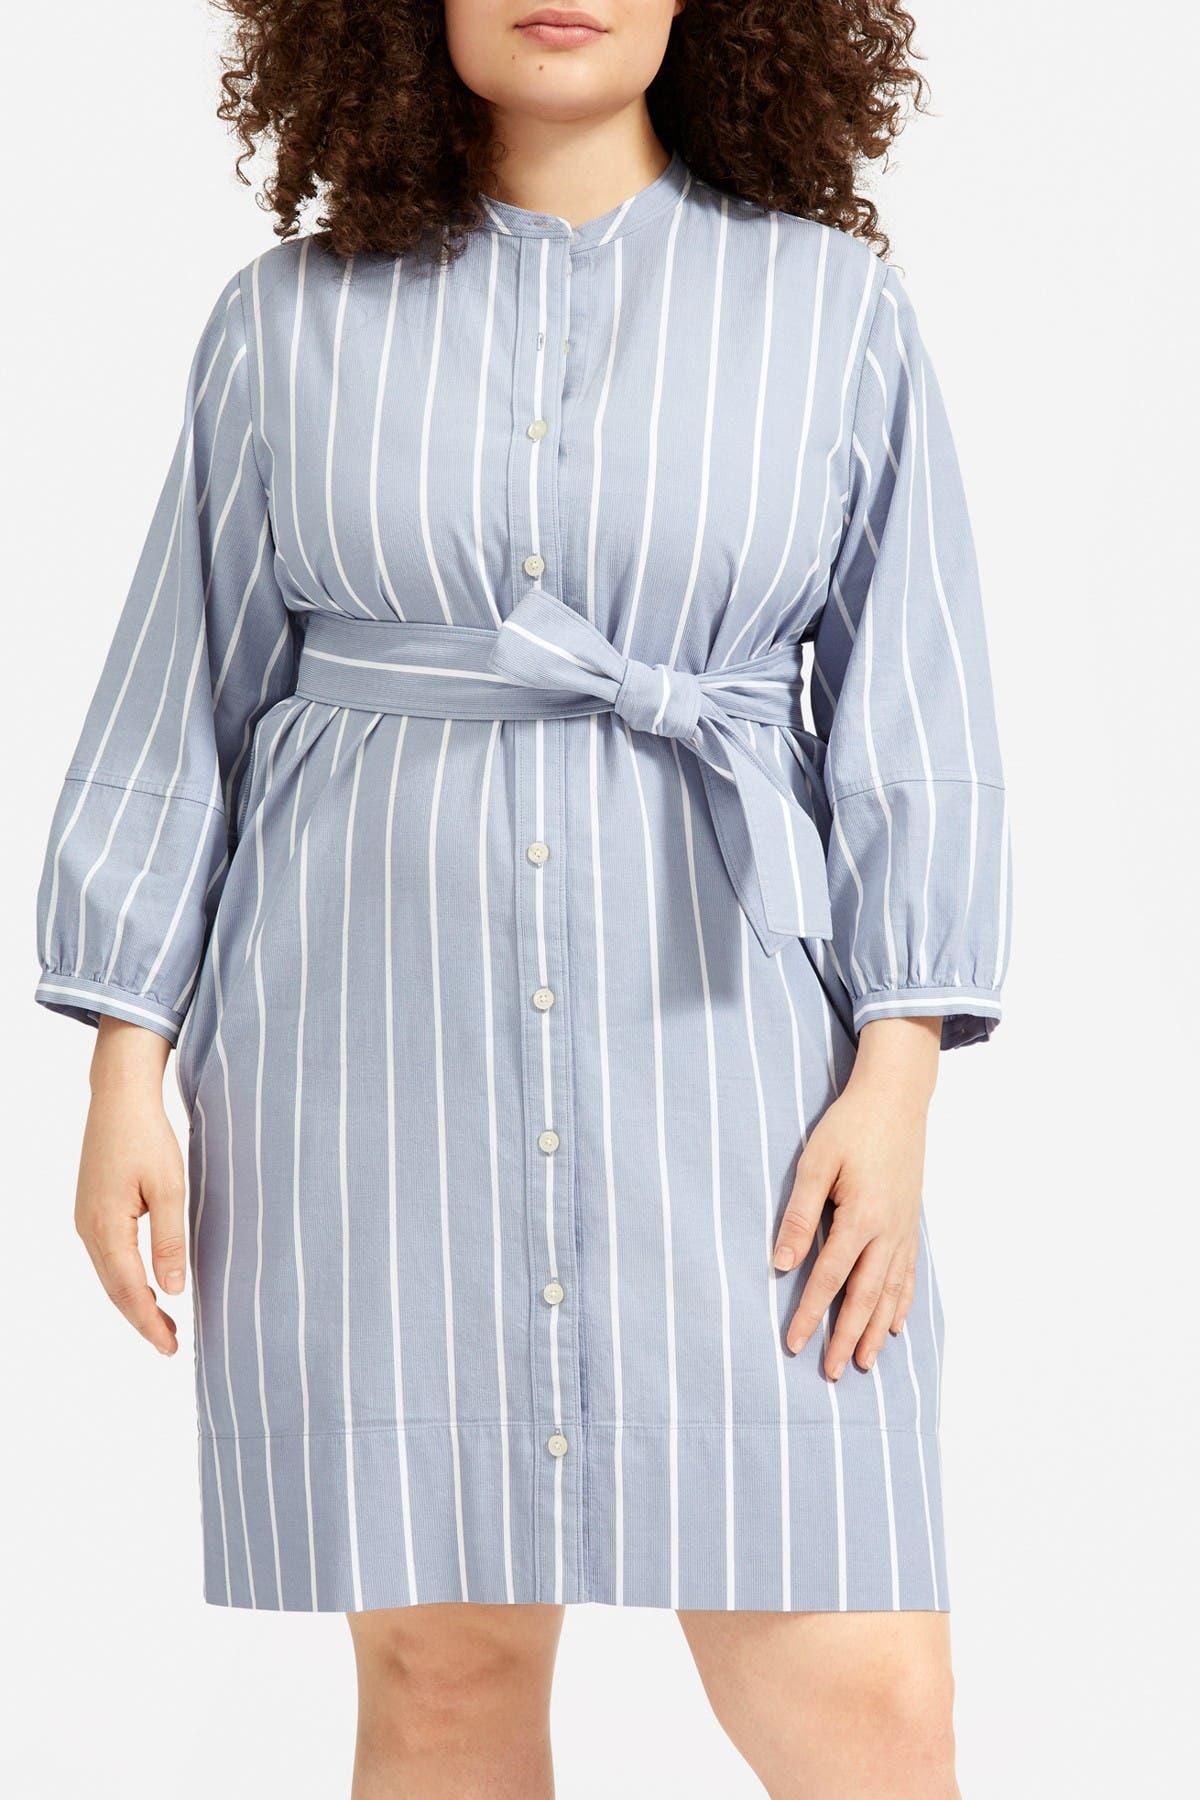 Image of EVERLANE The Cotton Weave Collarless Shirtdress